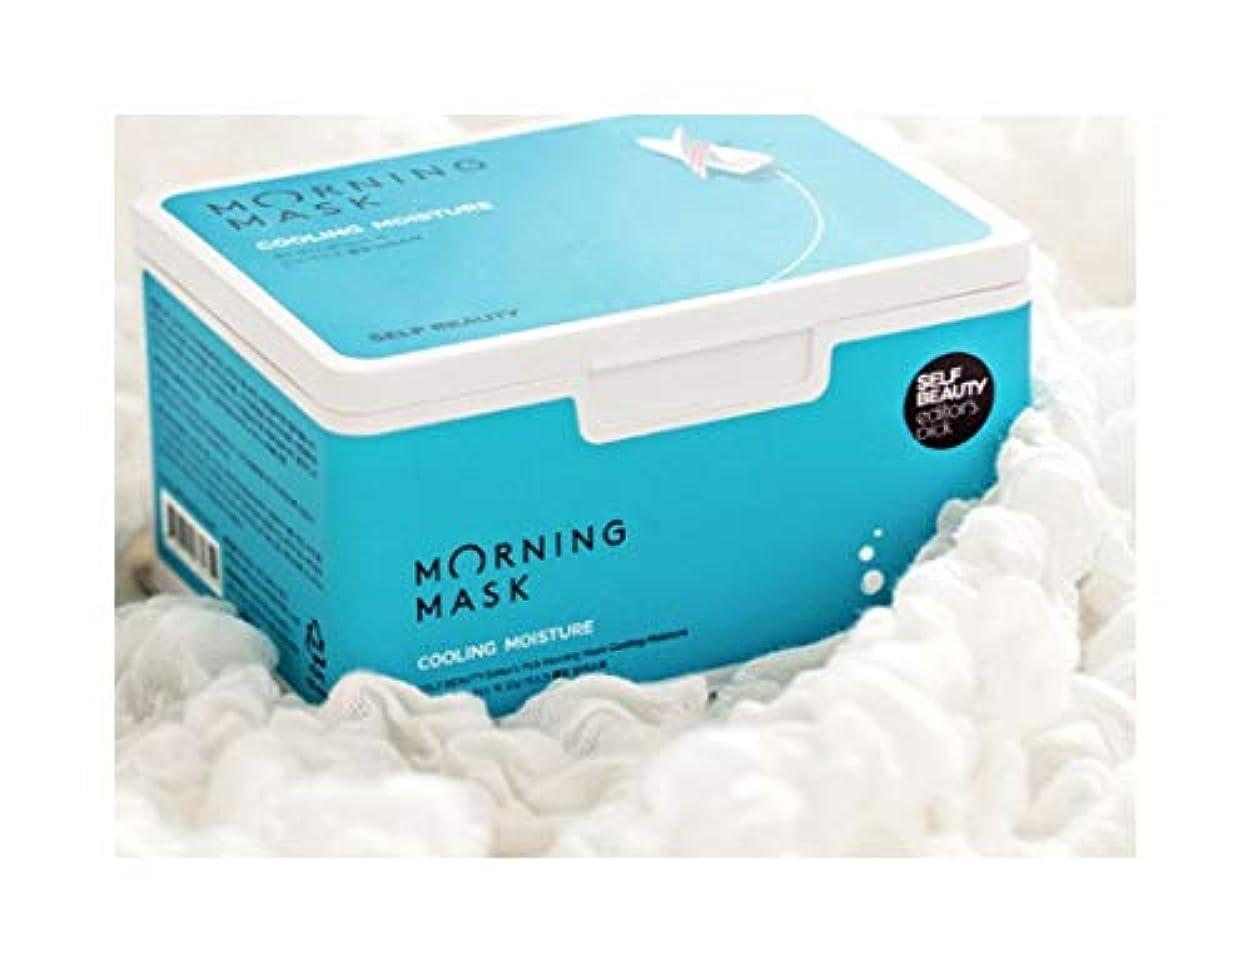 Self Beauty Morning Mask Cooling Moisture 1Box/30Sheet メイク前モーニングマスク、クーリングパック(海外直送品)